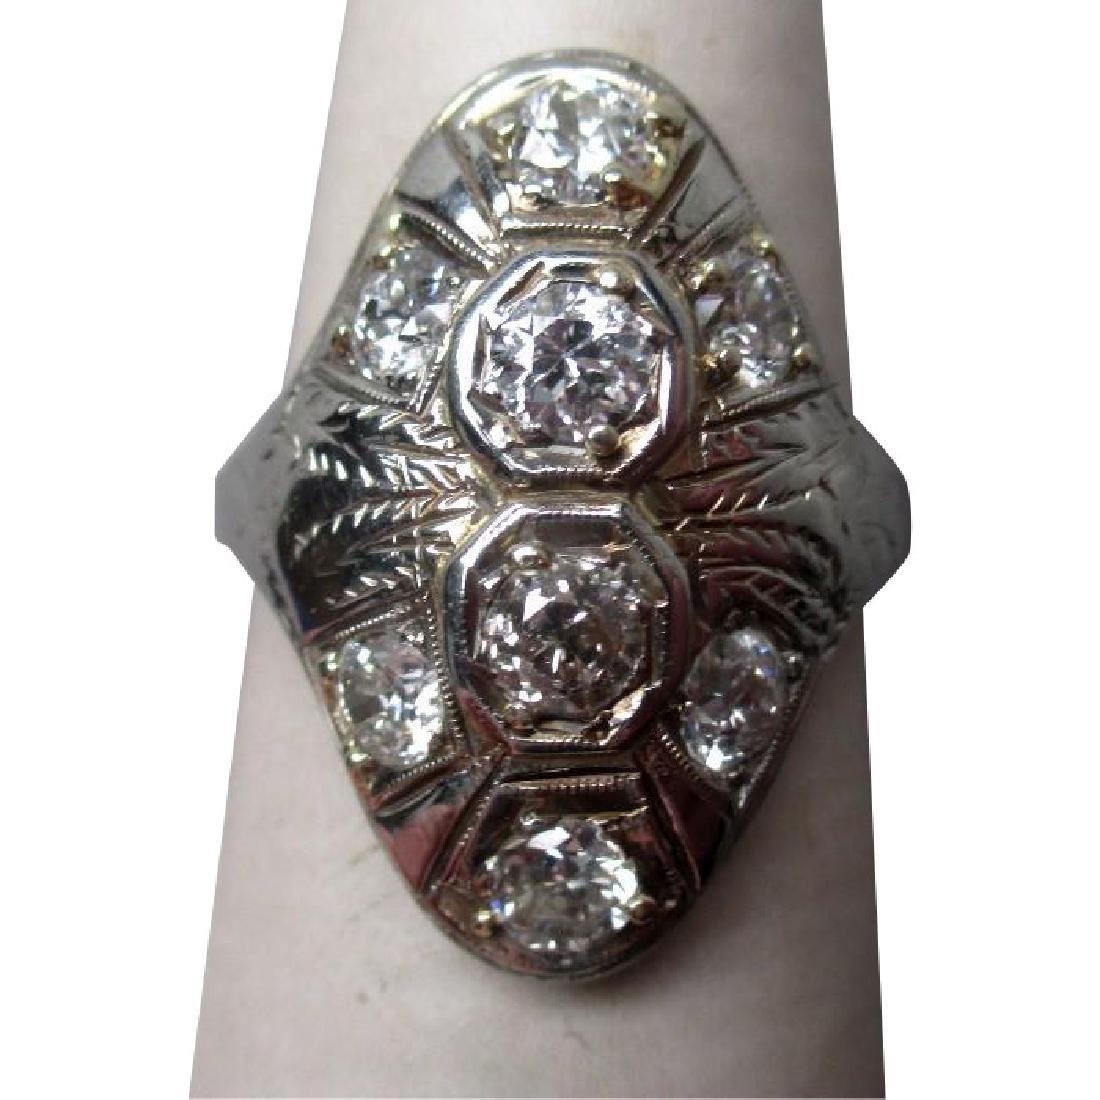 Stunning 18k White Gold and Multiple Diamond Ring